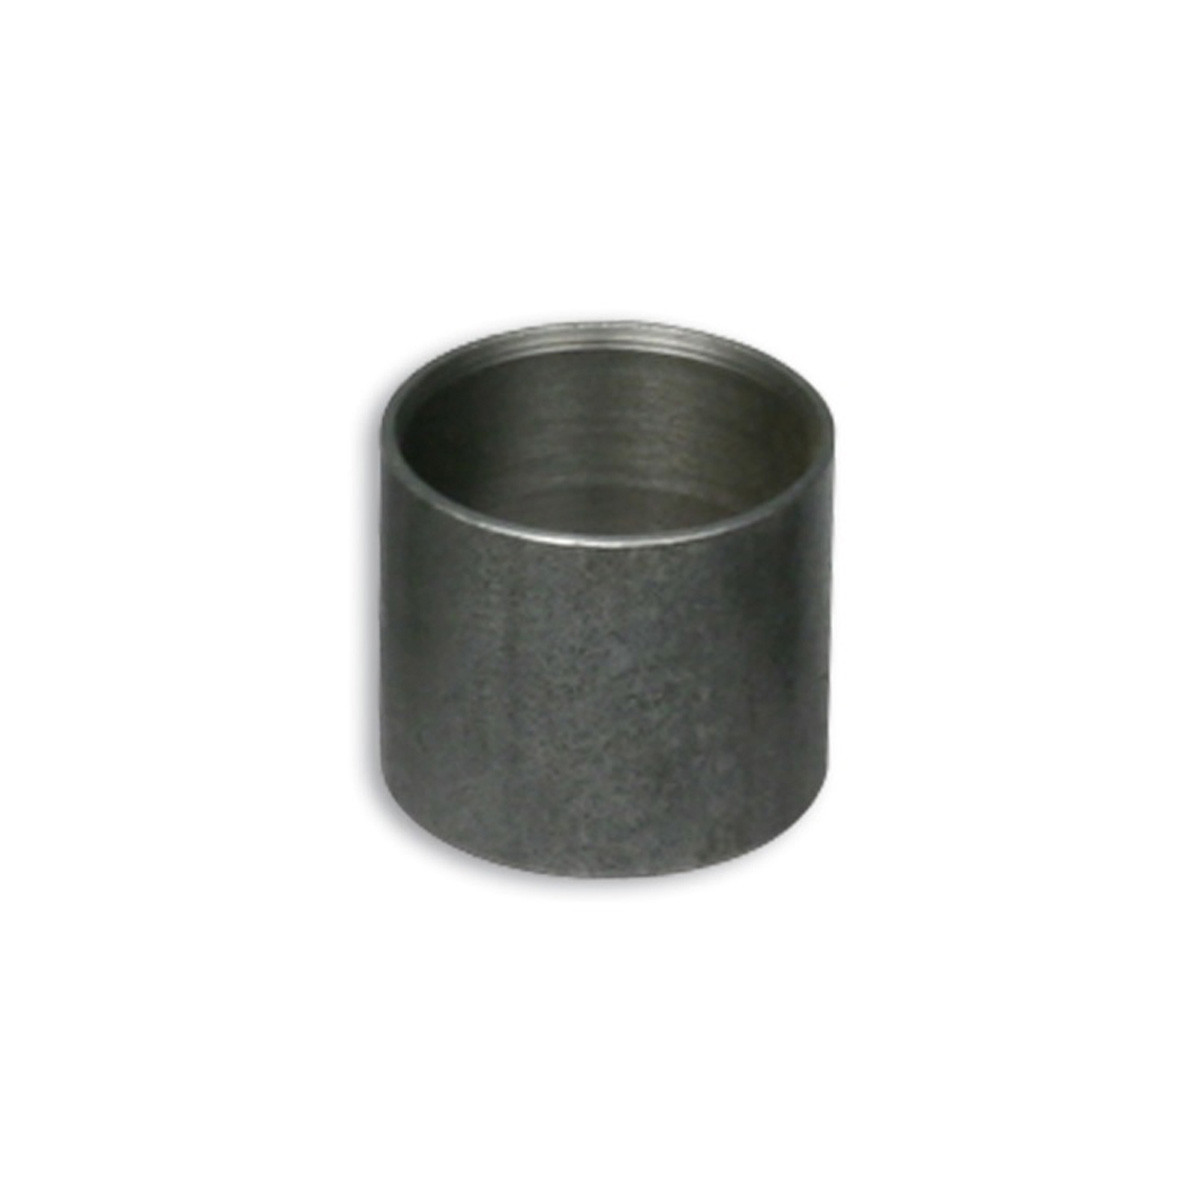 Reducteur echappement Ø22mm - Ø28mm - MALOSSI